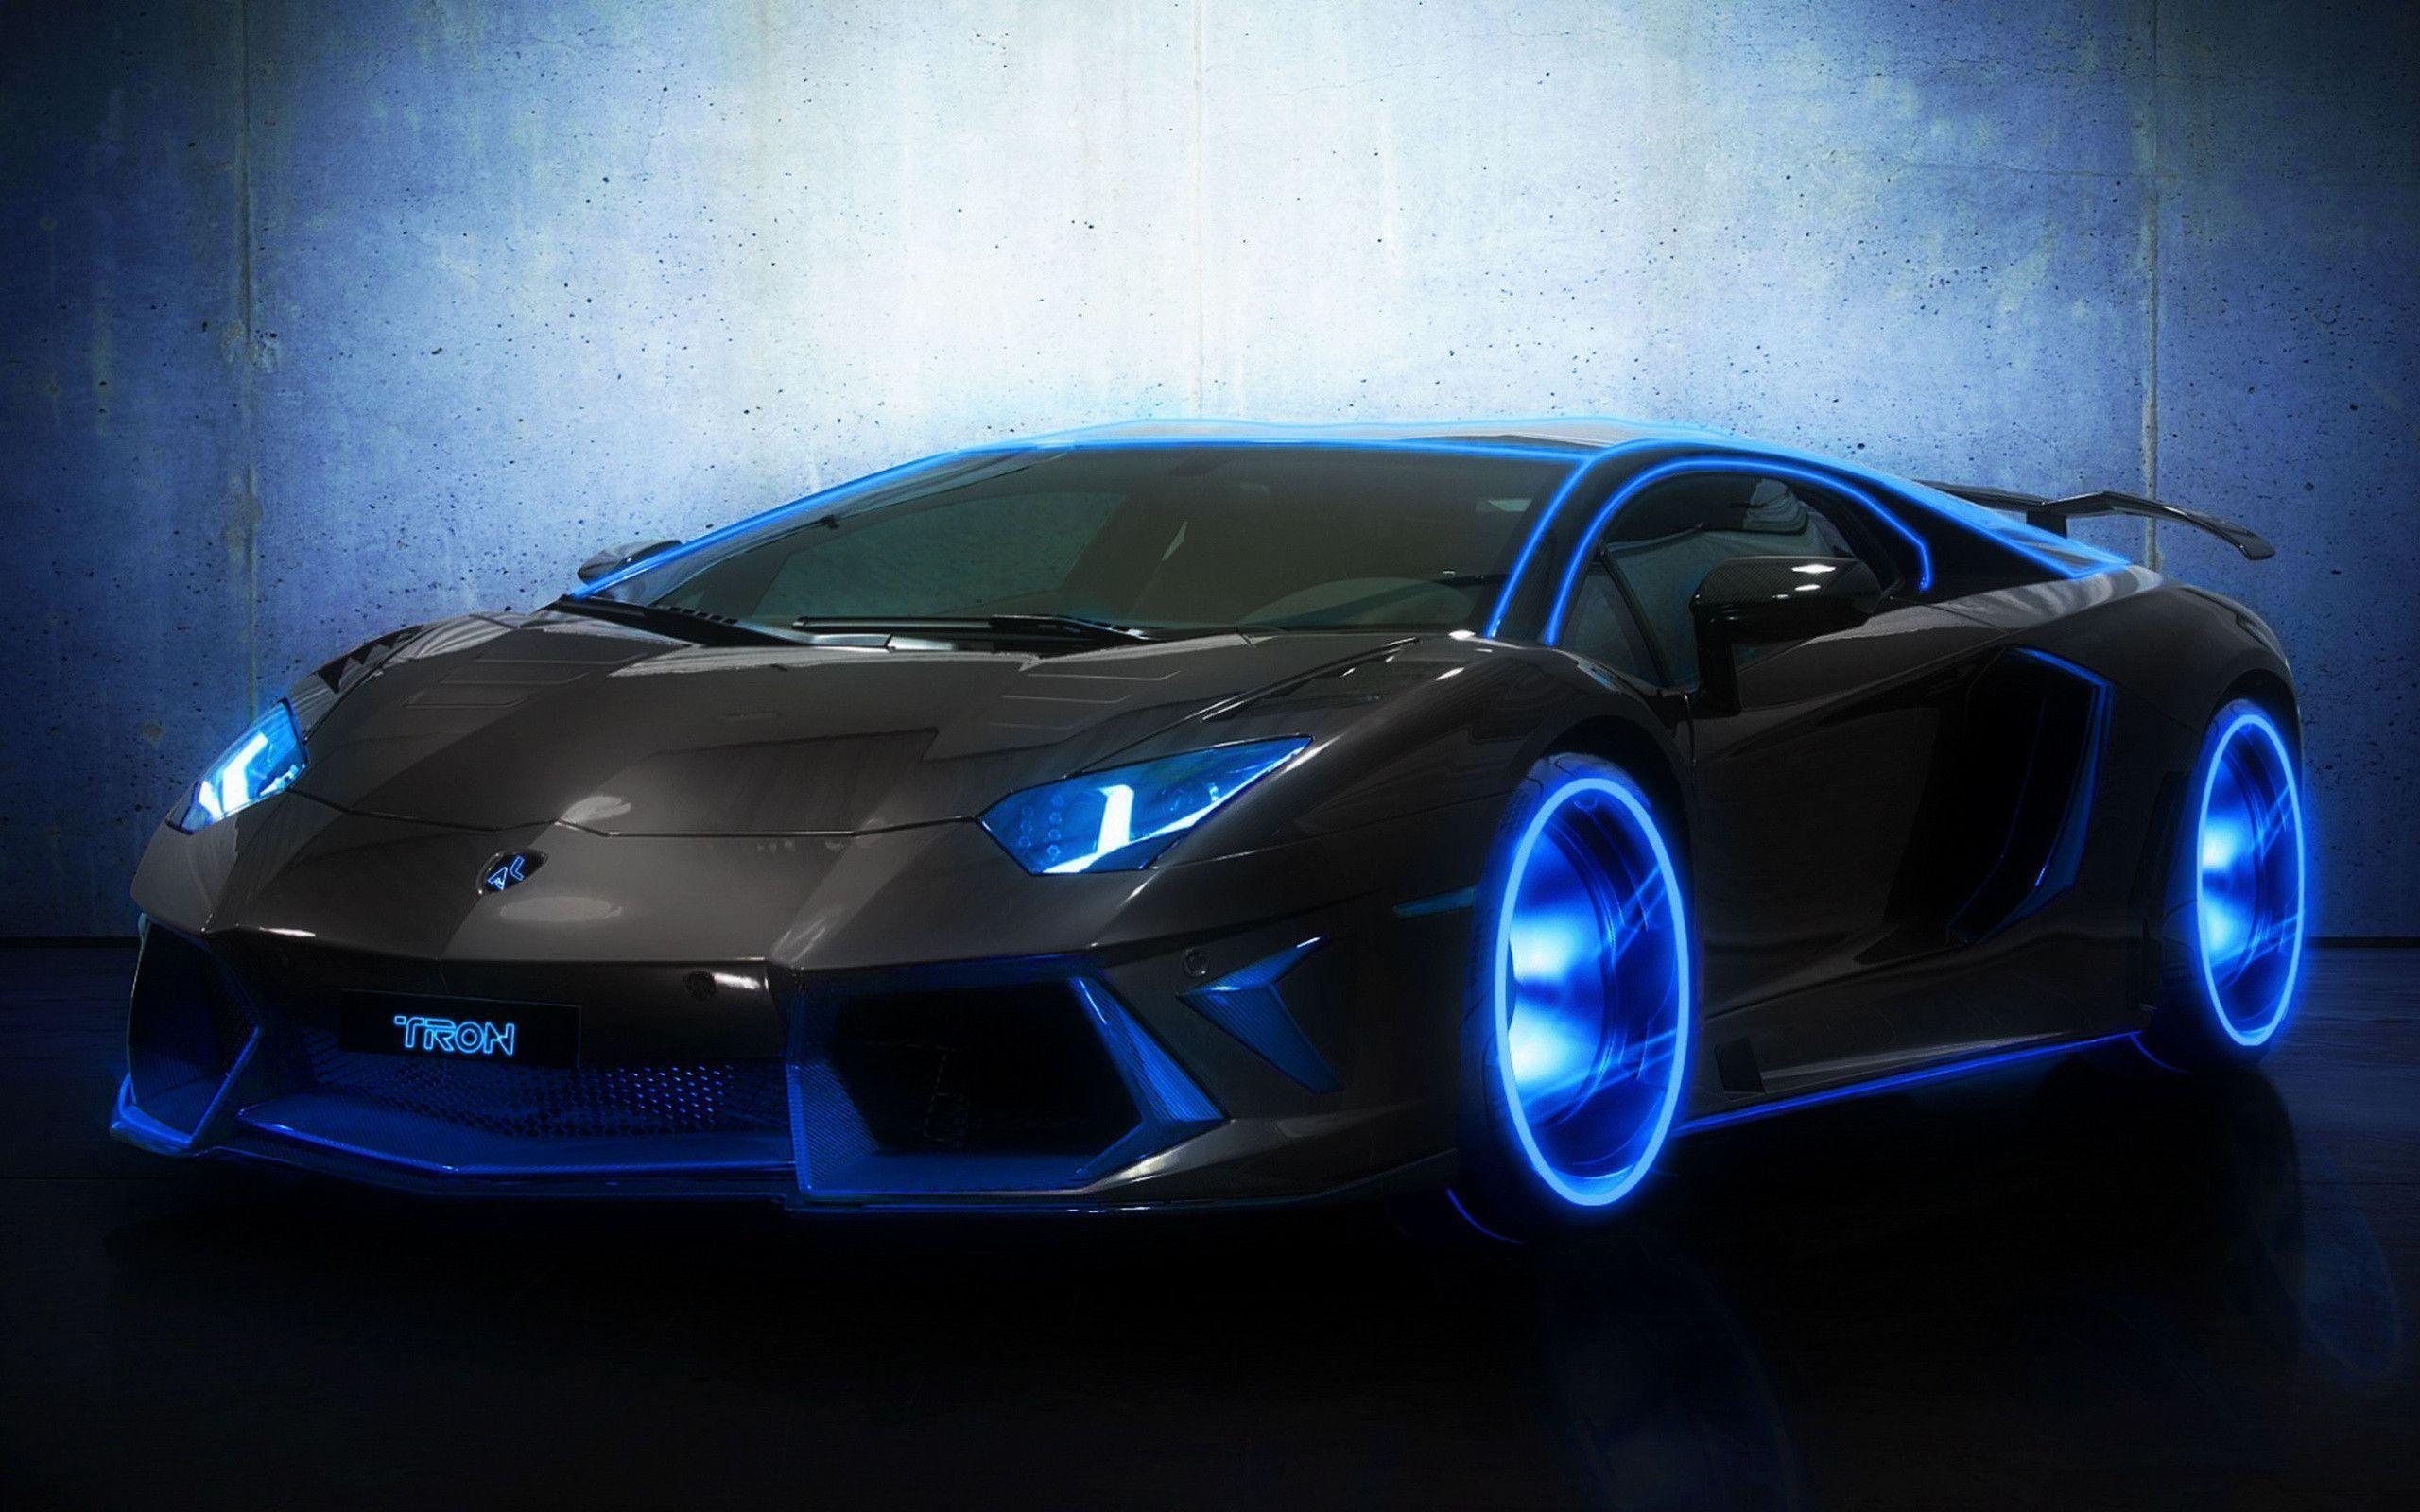 Res: 2560x1600, Lamborghini Aventador Blue - Cars Wallpapers (1572) ilikewalls.